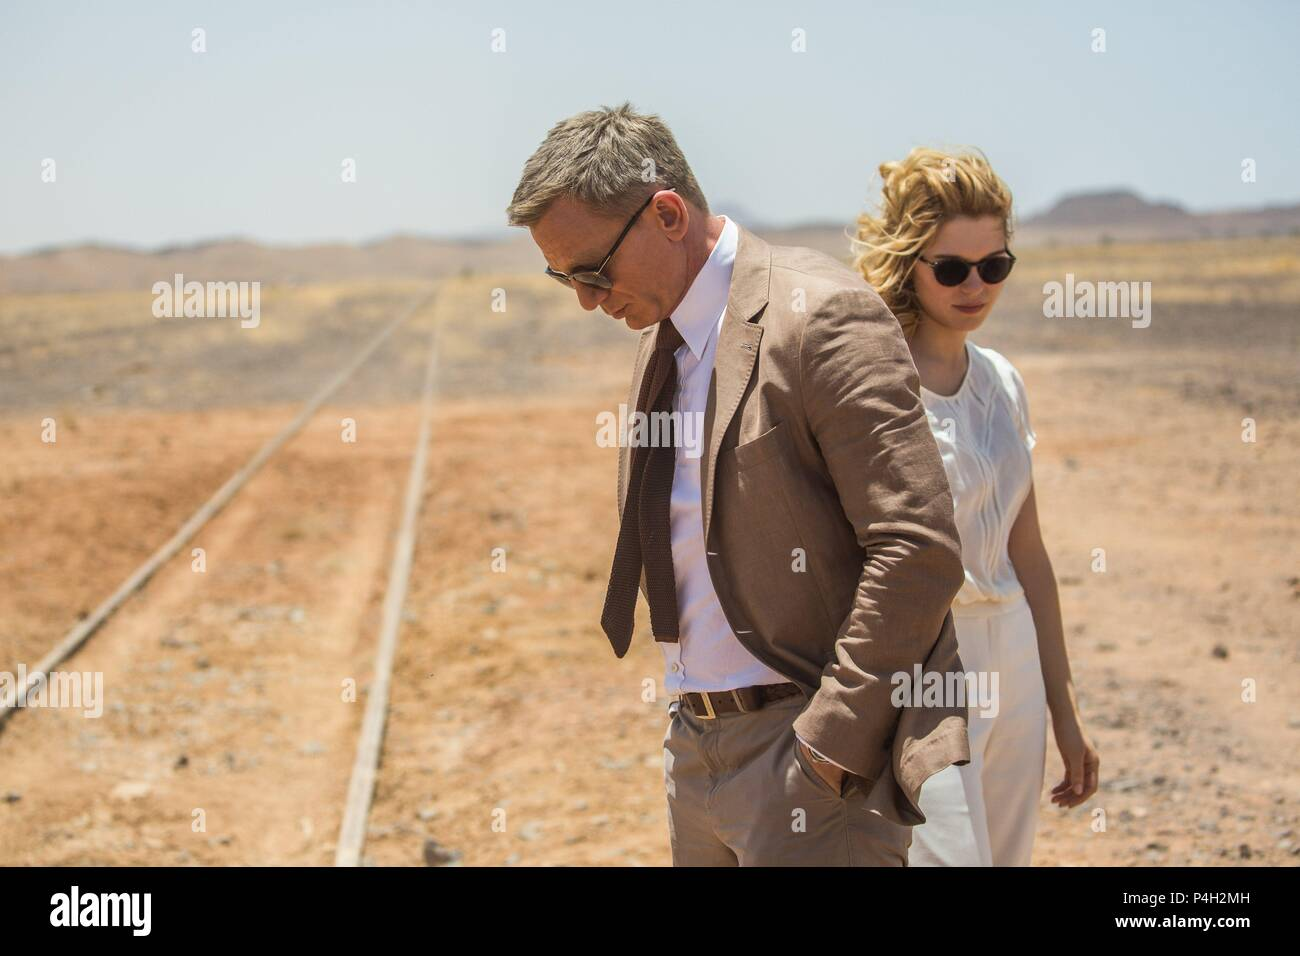 Original Film Title: SPECTRE.  English Title: SPECTRE.  Film Director: SAM MENDES.  Year: 2015.  Stars: DANIEL CRAIG; LEA SEYDOUX. Credit: COLUMBIA PICTURES / Album - Stock Image